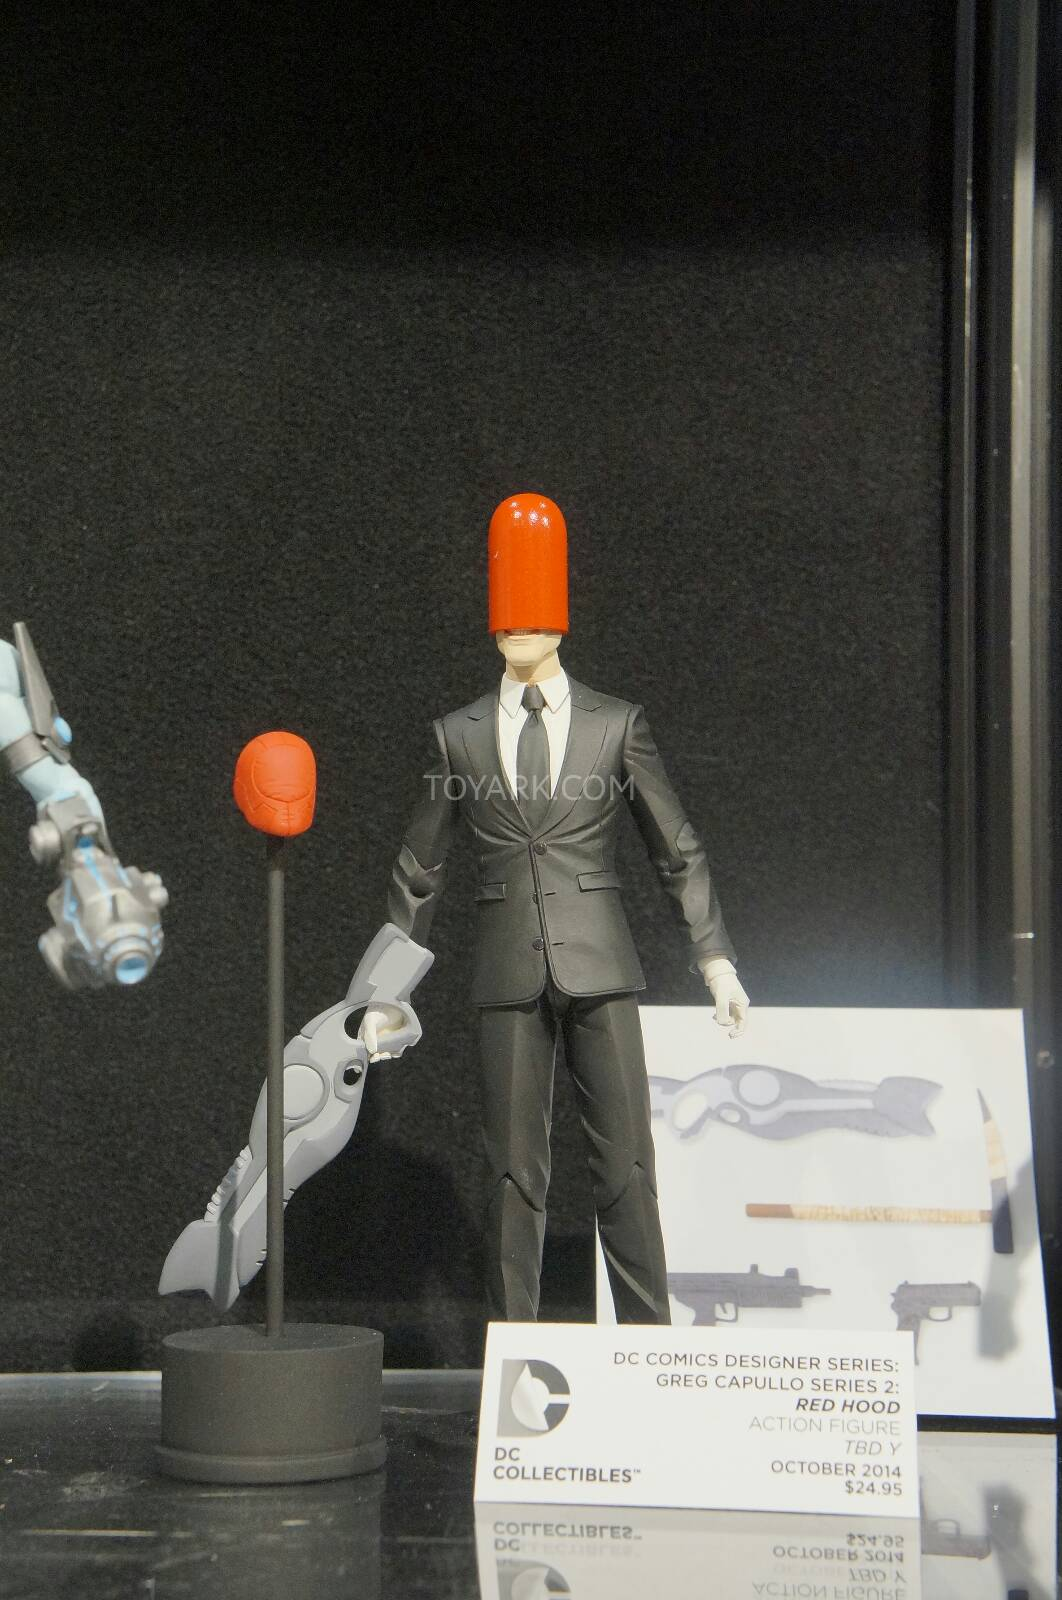 [Toy Fair 2014] DC Collectibles Toy-Fair-2014-DC-Collectibles-090